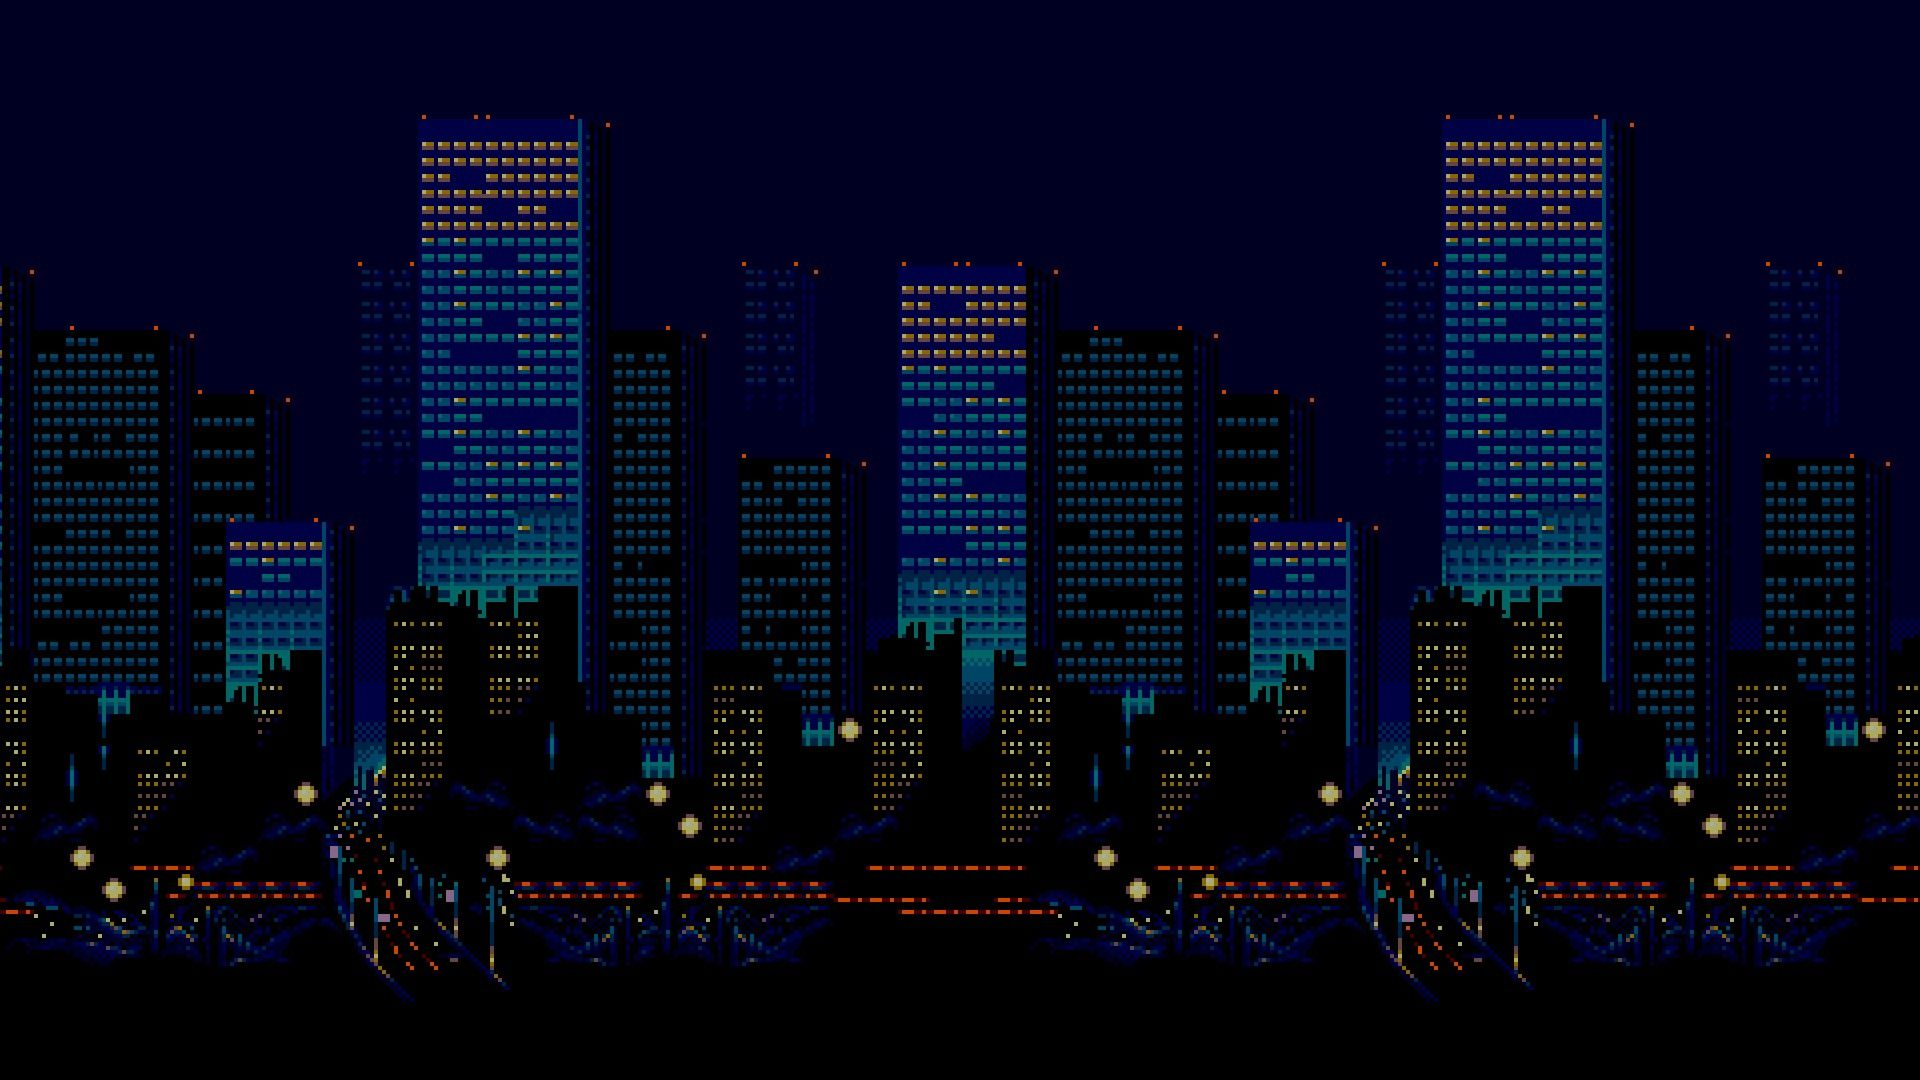 Streets Of Tude Background Pixel Art Hd Wallpaper City Wallpaper